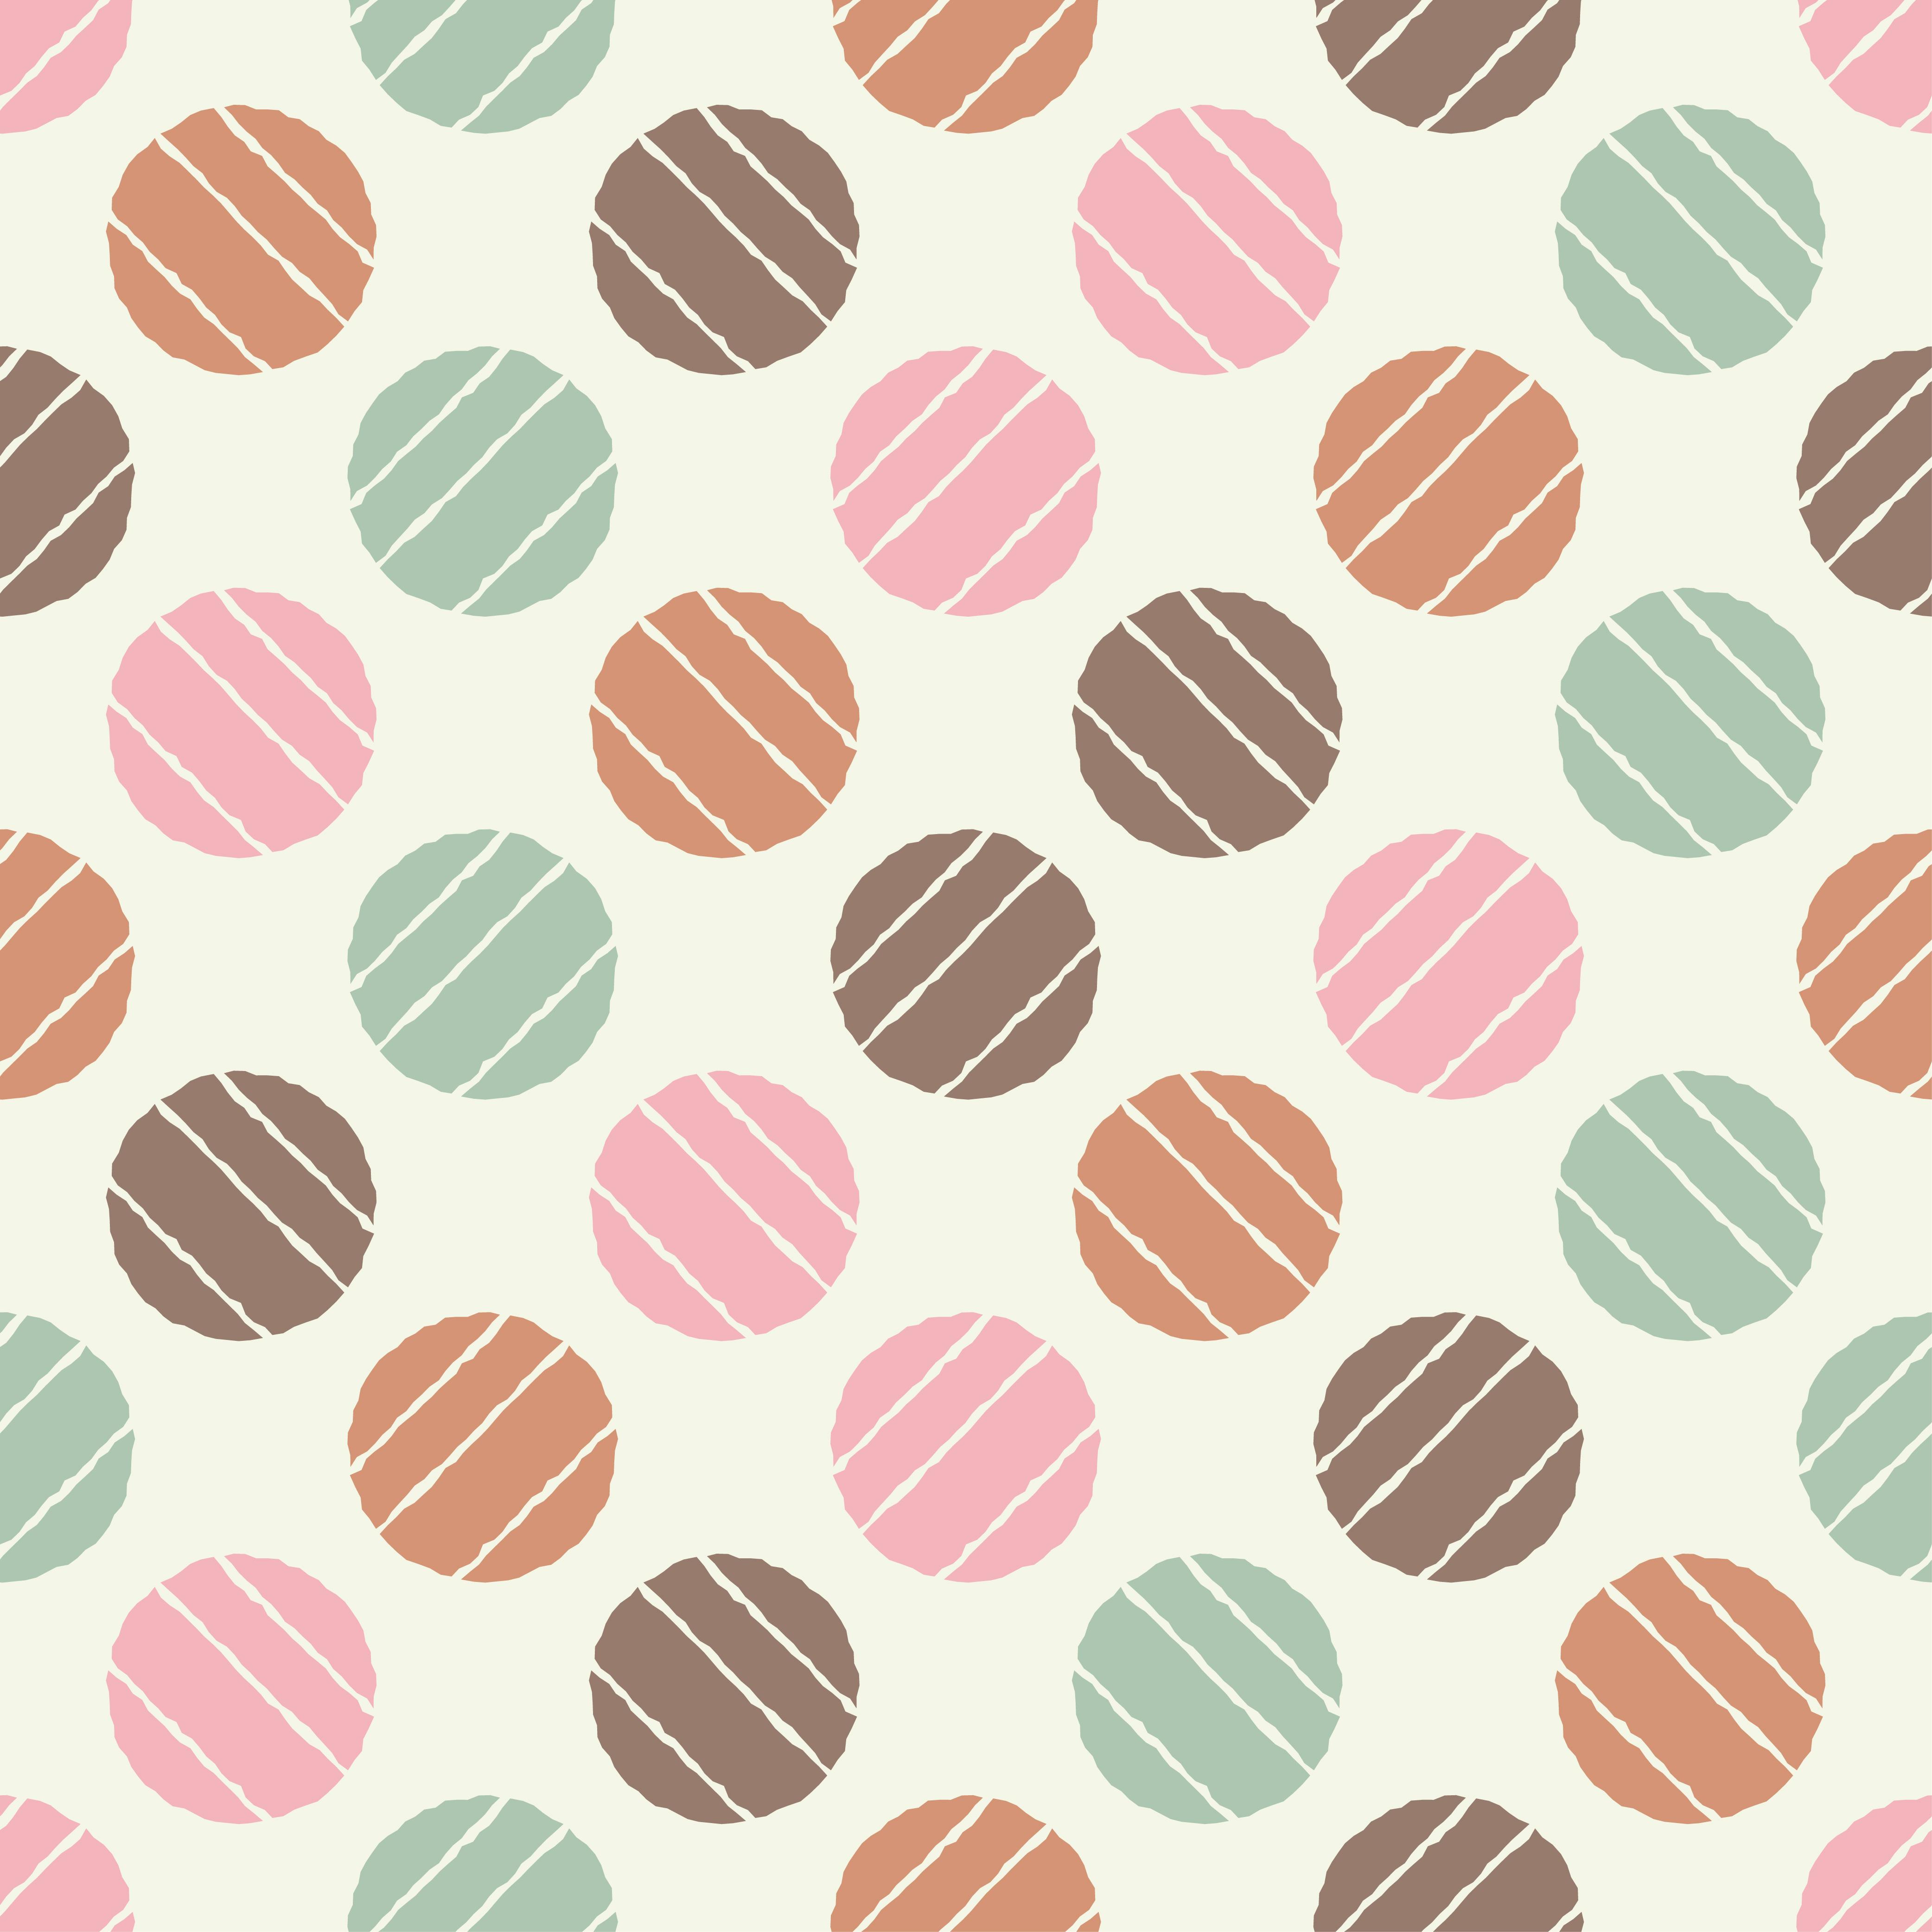 Polka dot seamless pattern. Sketch texture.  example image 6